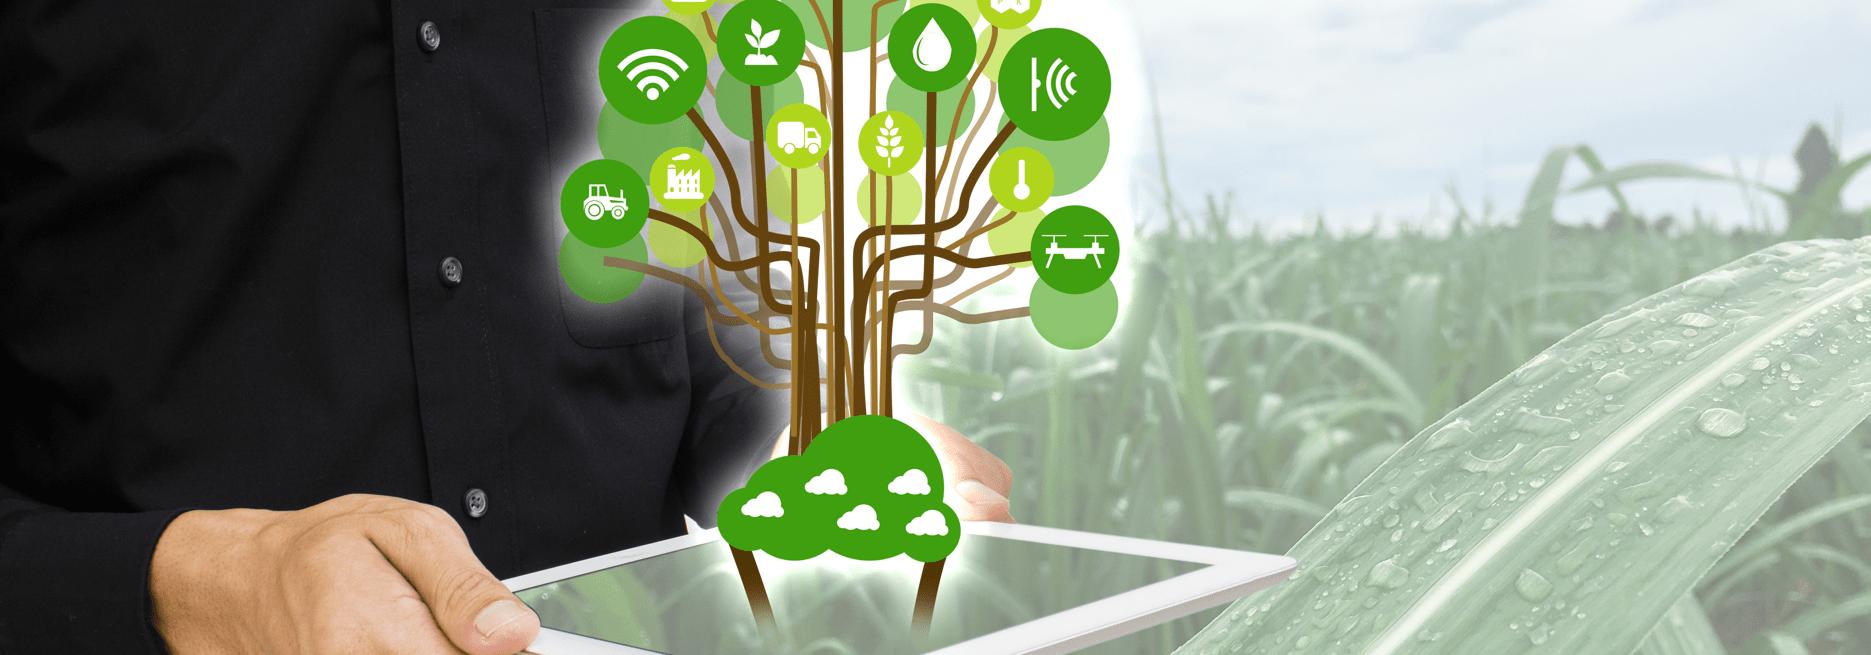 Celluar connectivity for agriculture